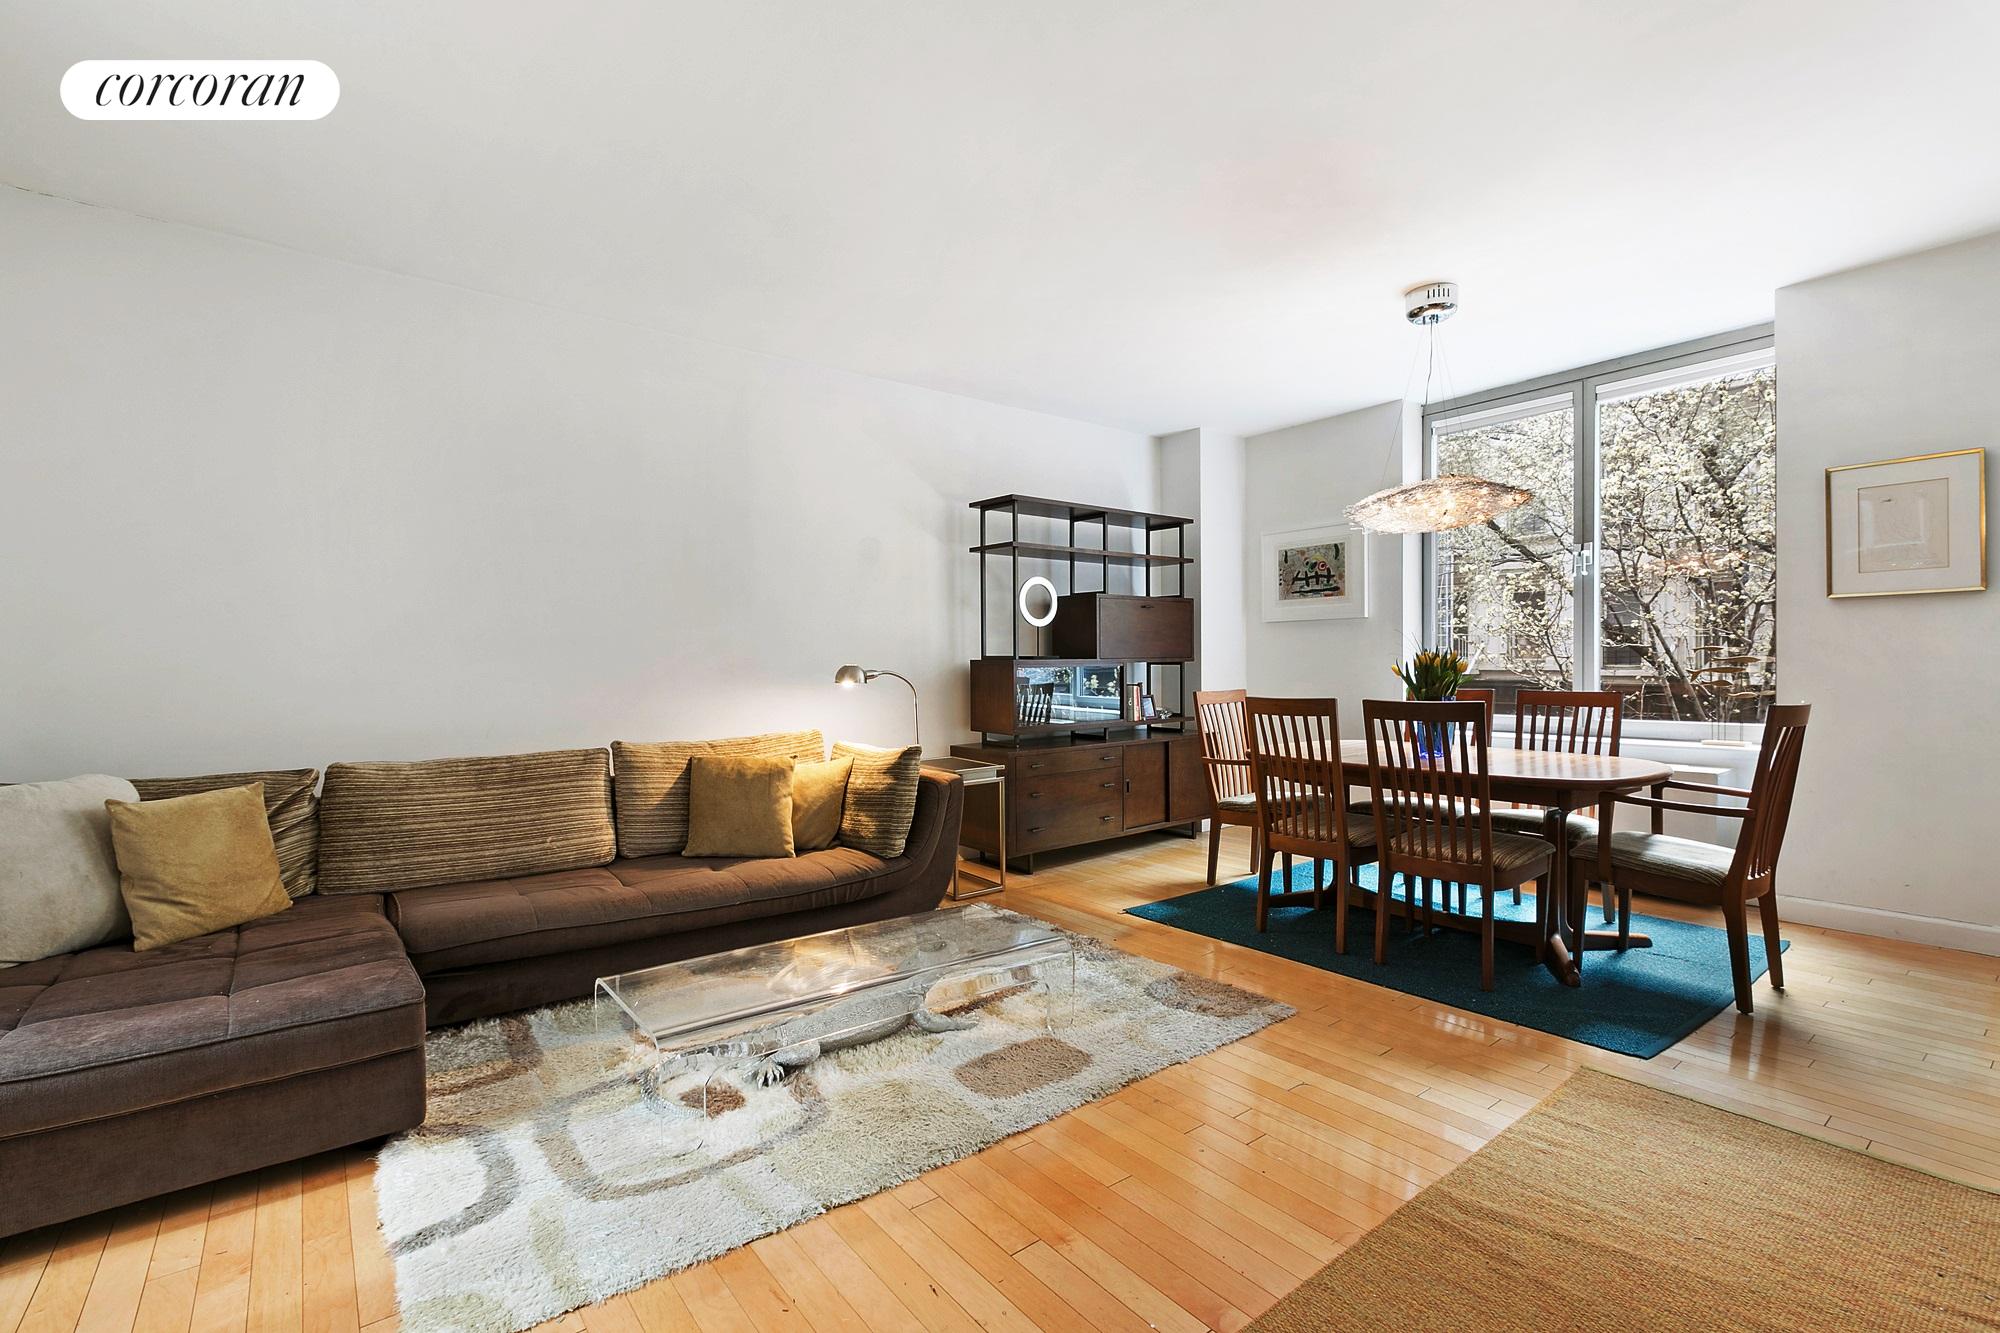 Corcoran Gabriella Winter Village 49 East 10th Street Realtor Real Estate Agent Broker Referral Experience New York Manhattan Brooklyn